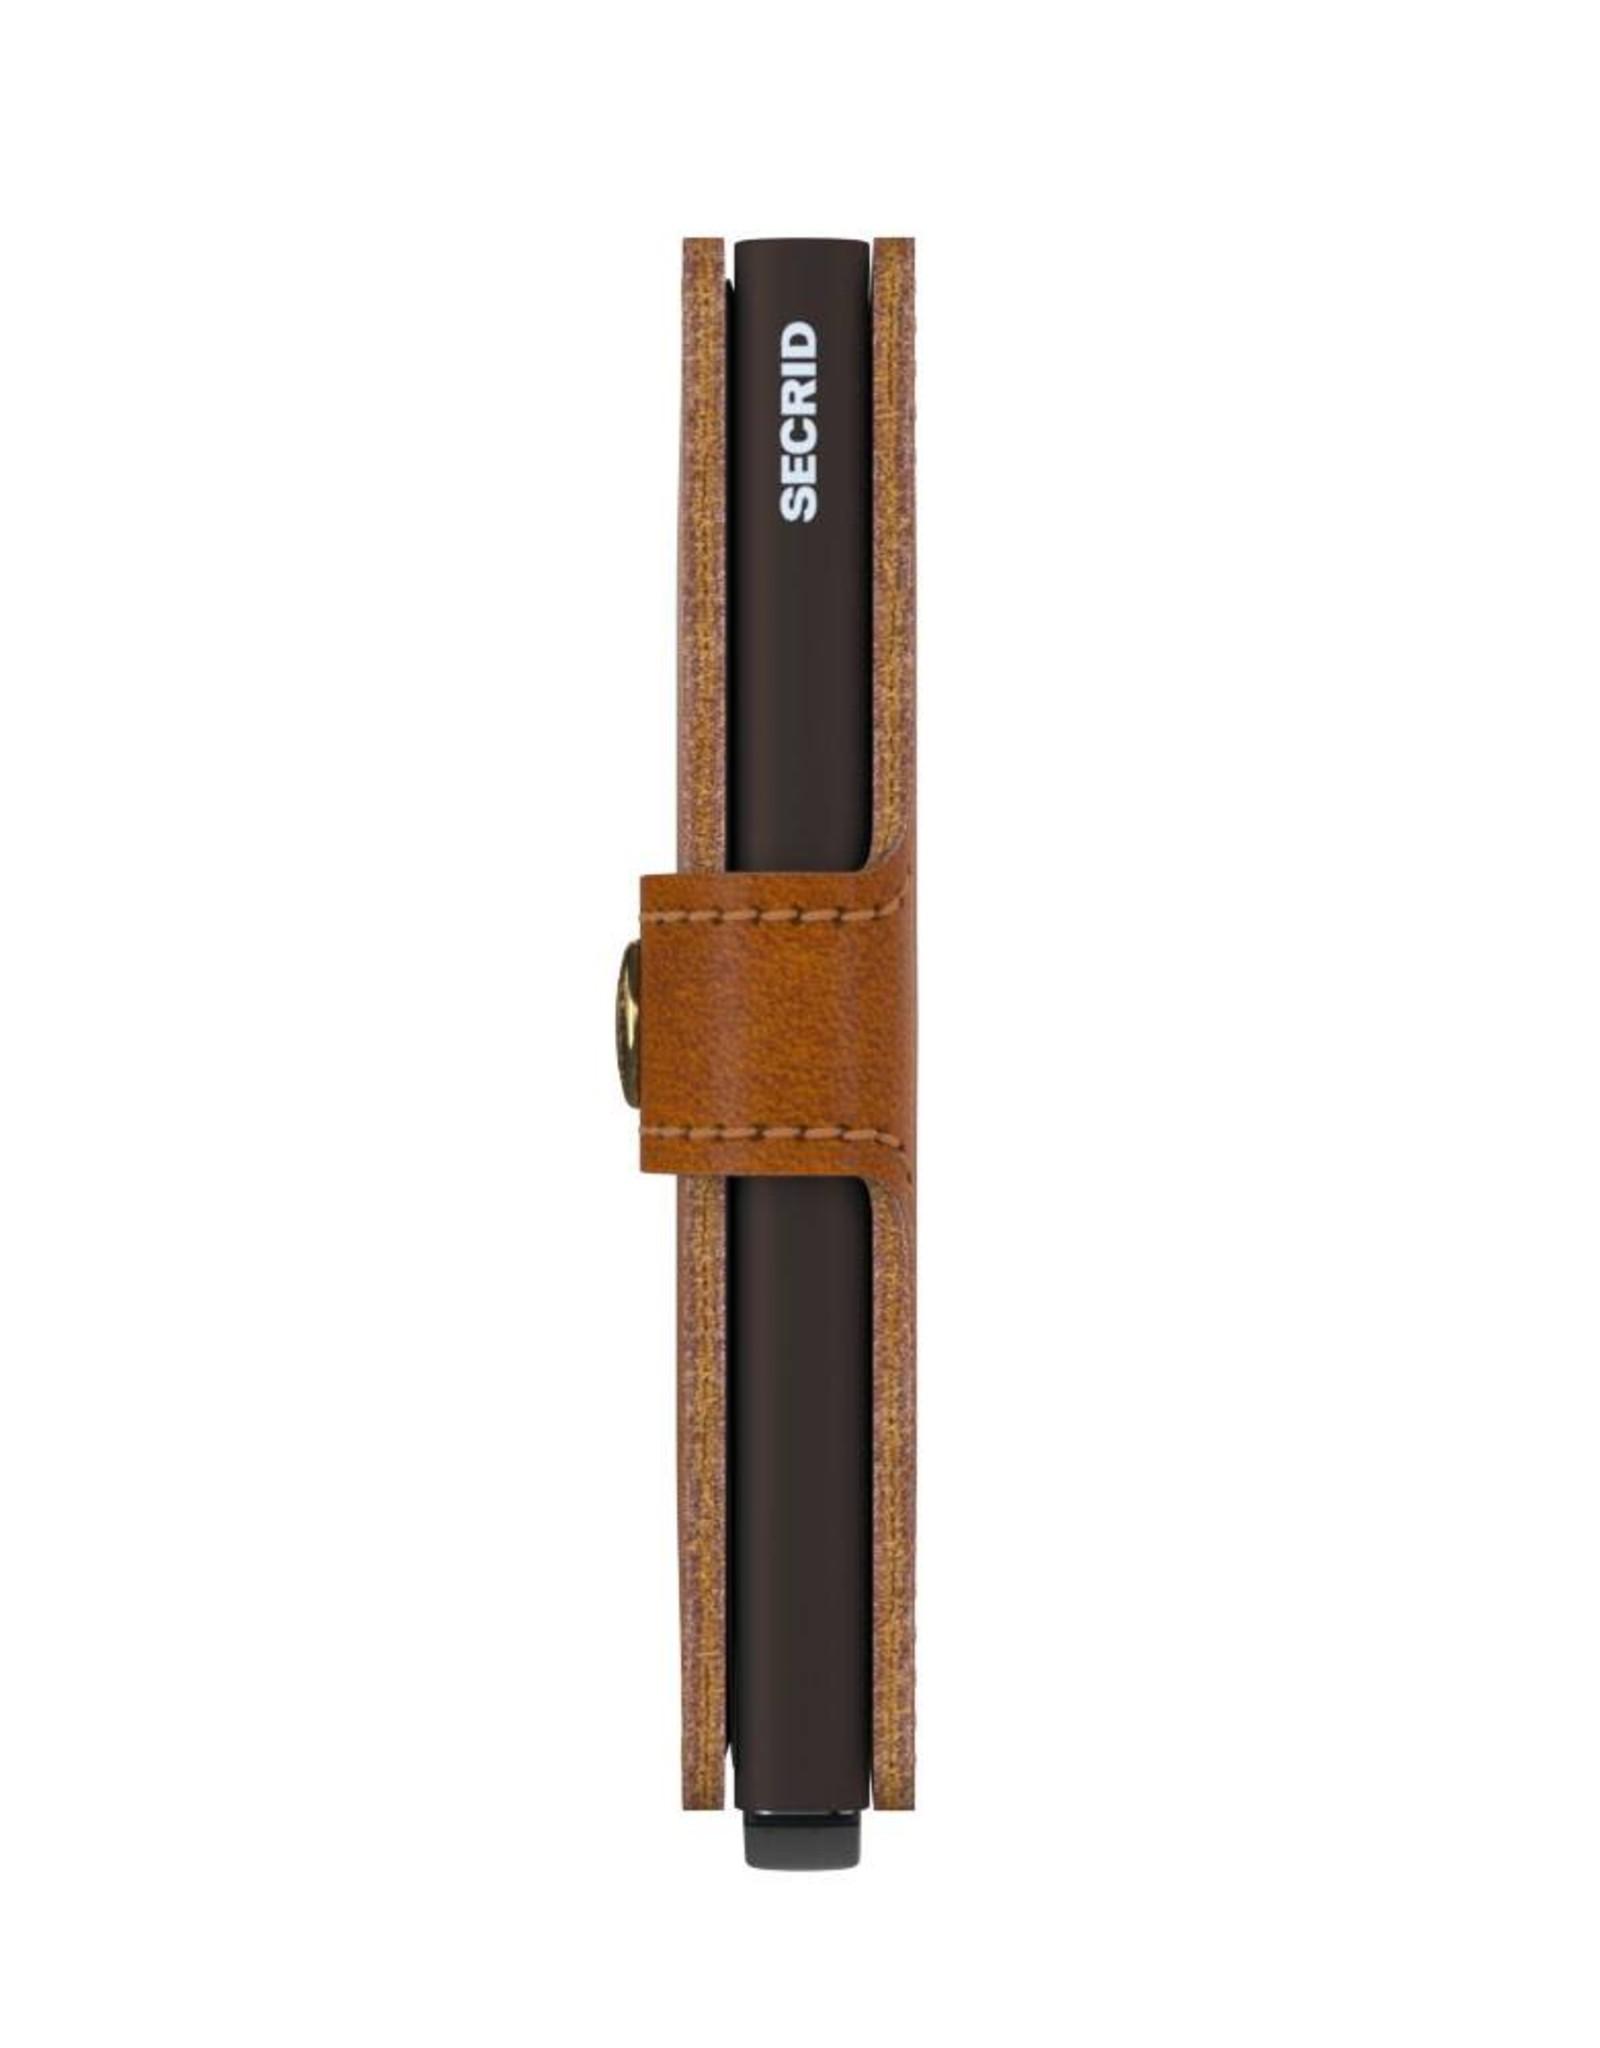 Secrid Miniwallet Original-cognac brown